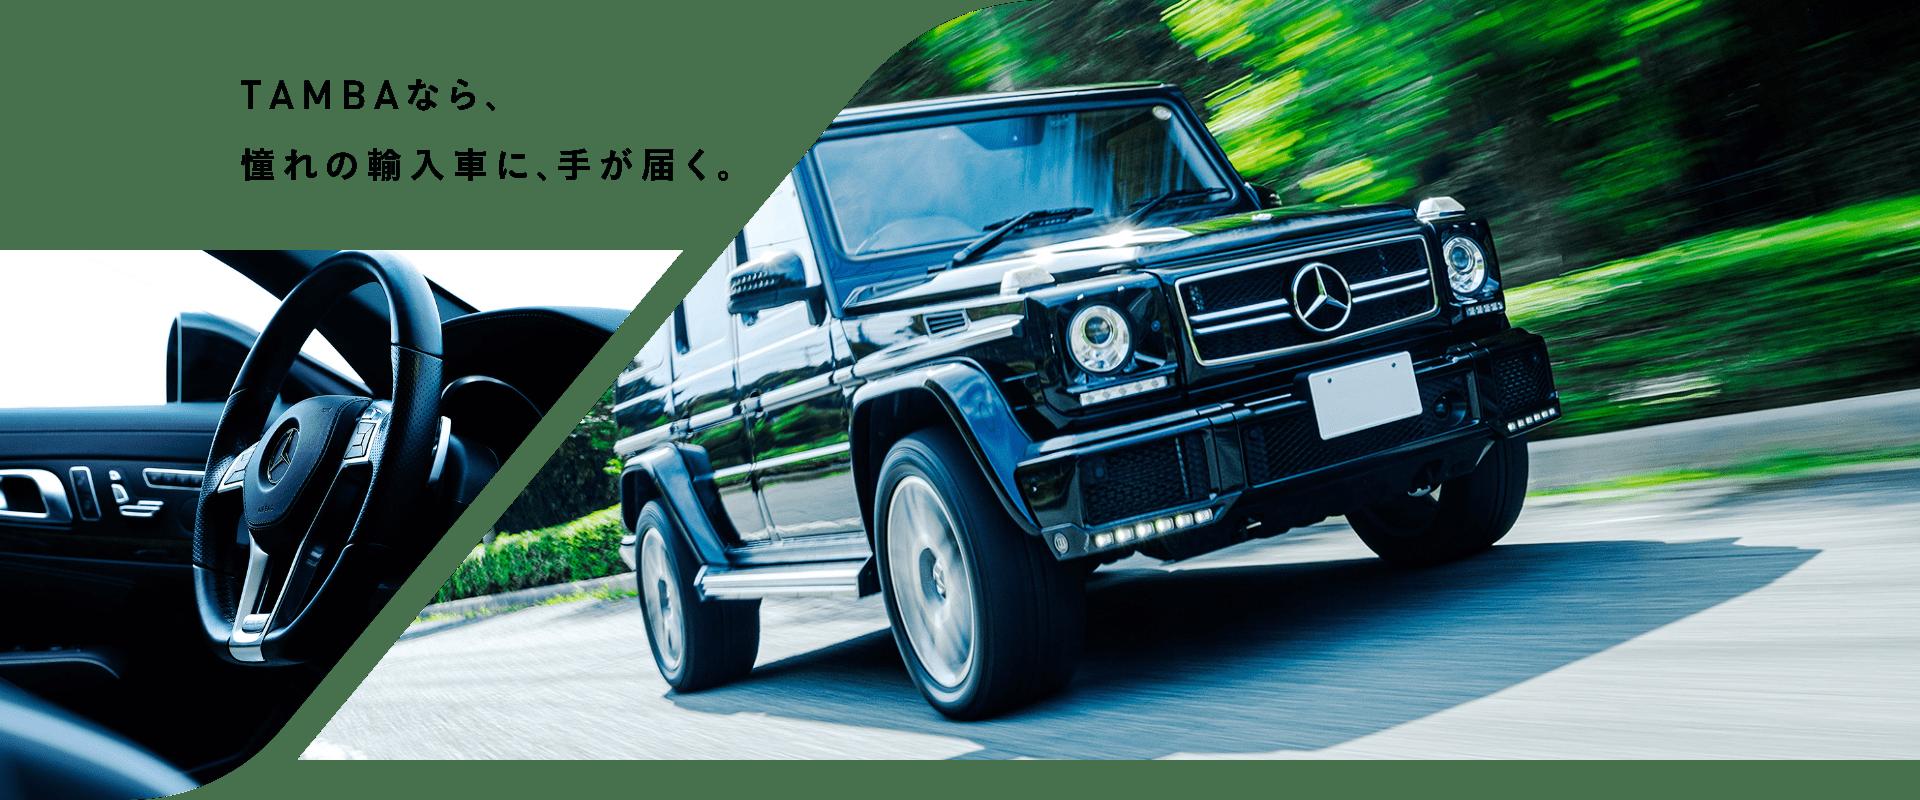 tanbaなら、憧れの輸入車に、手が届く。